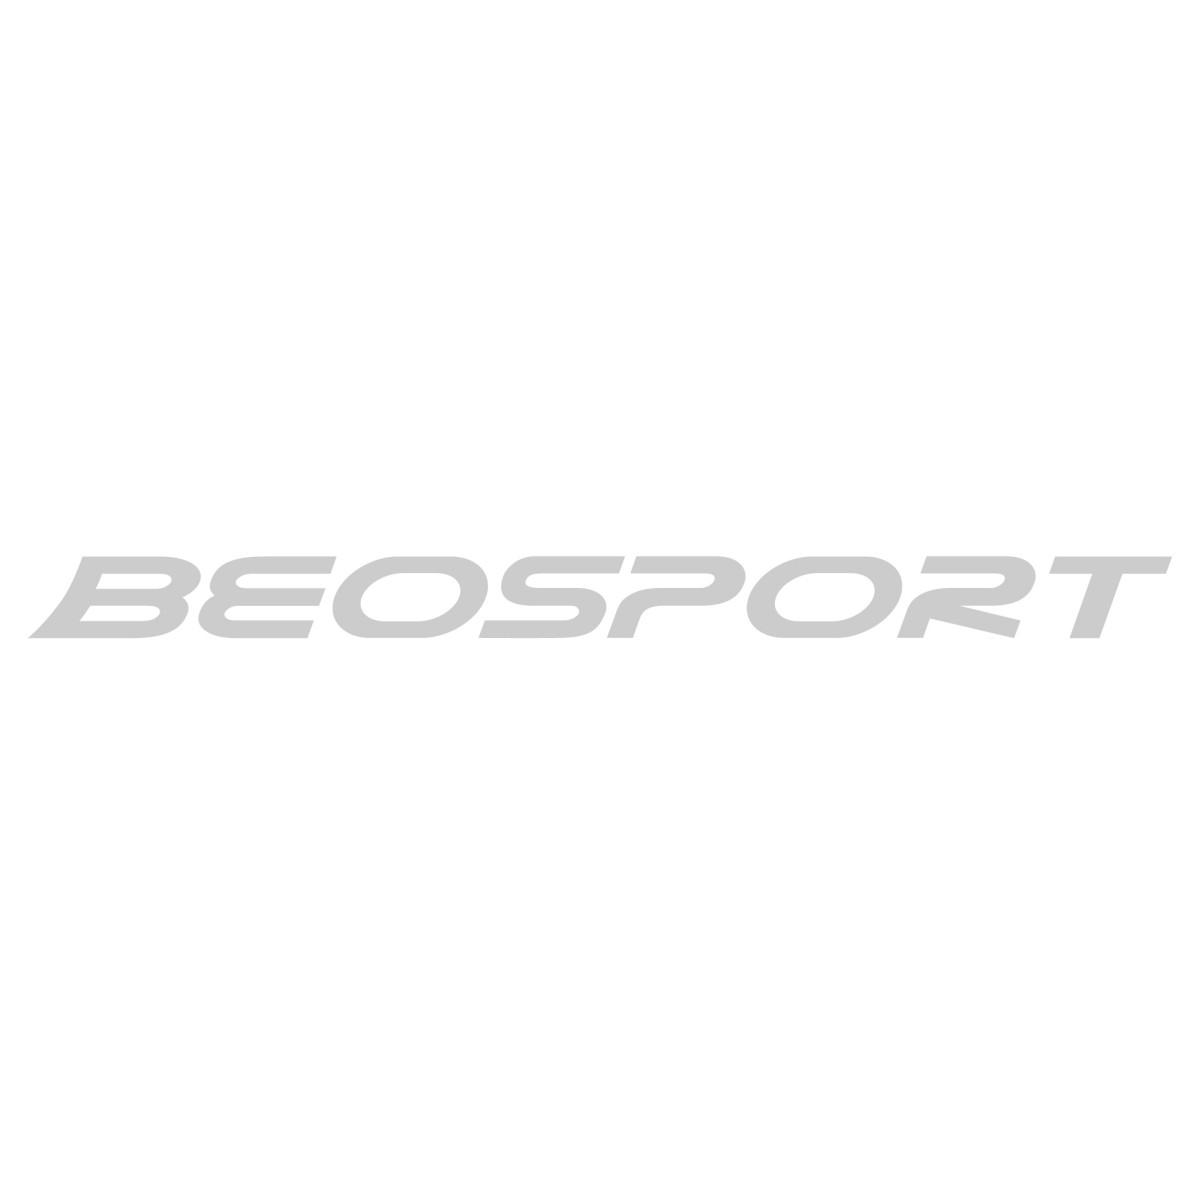 Dune Beacons cipele